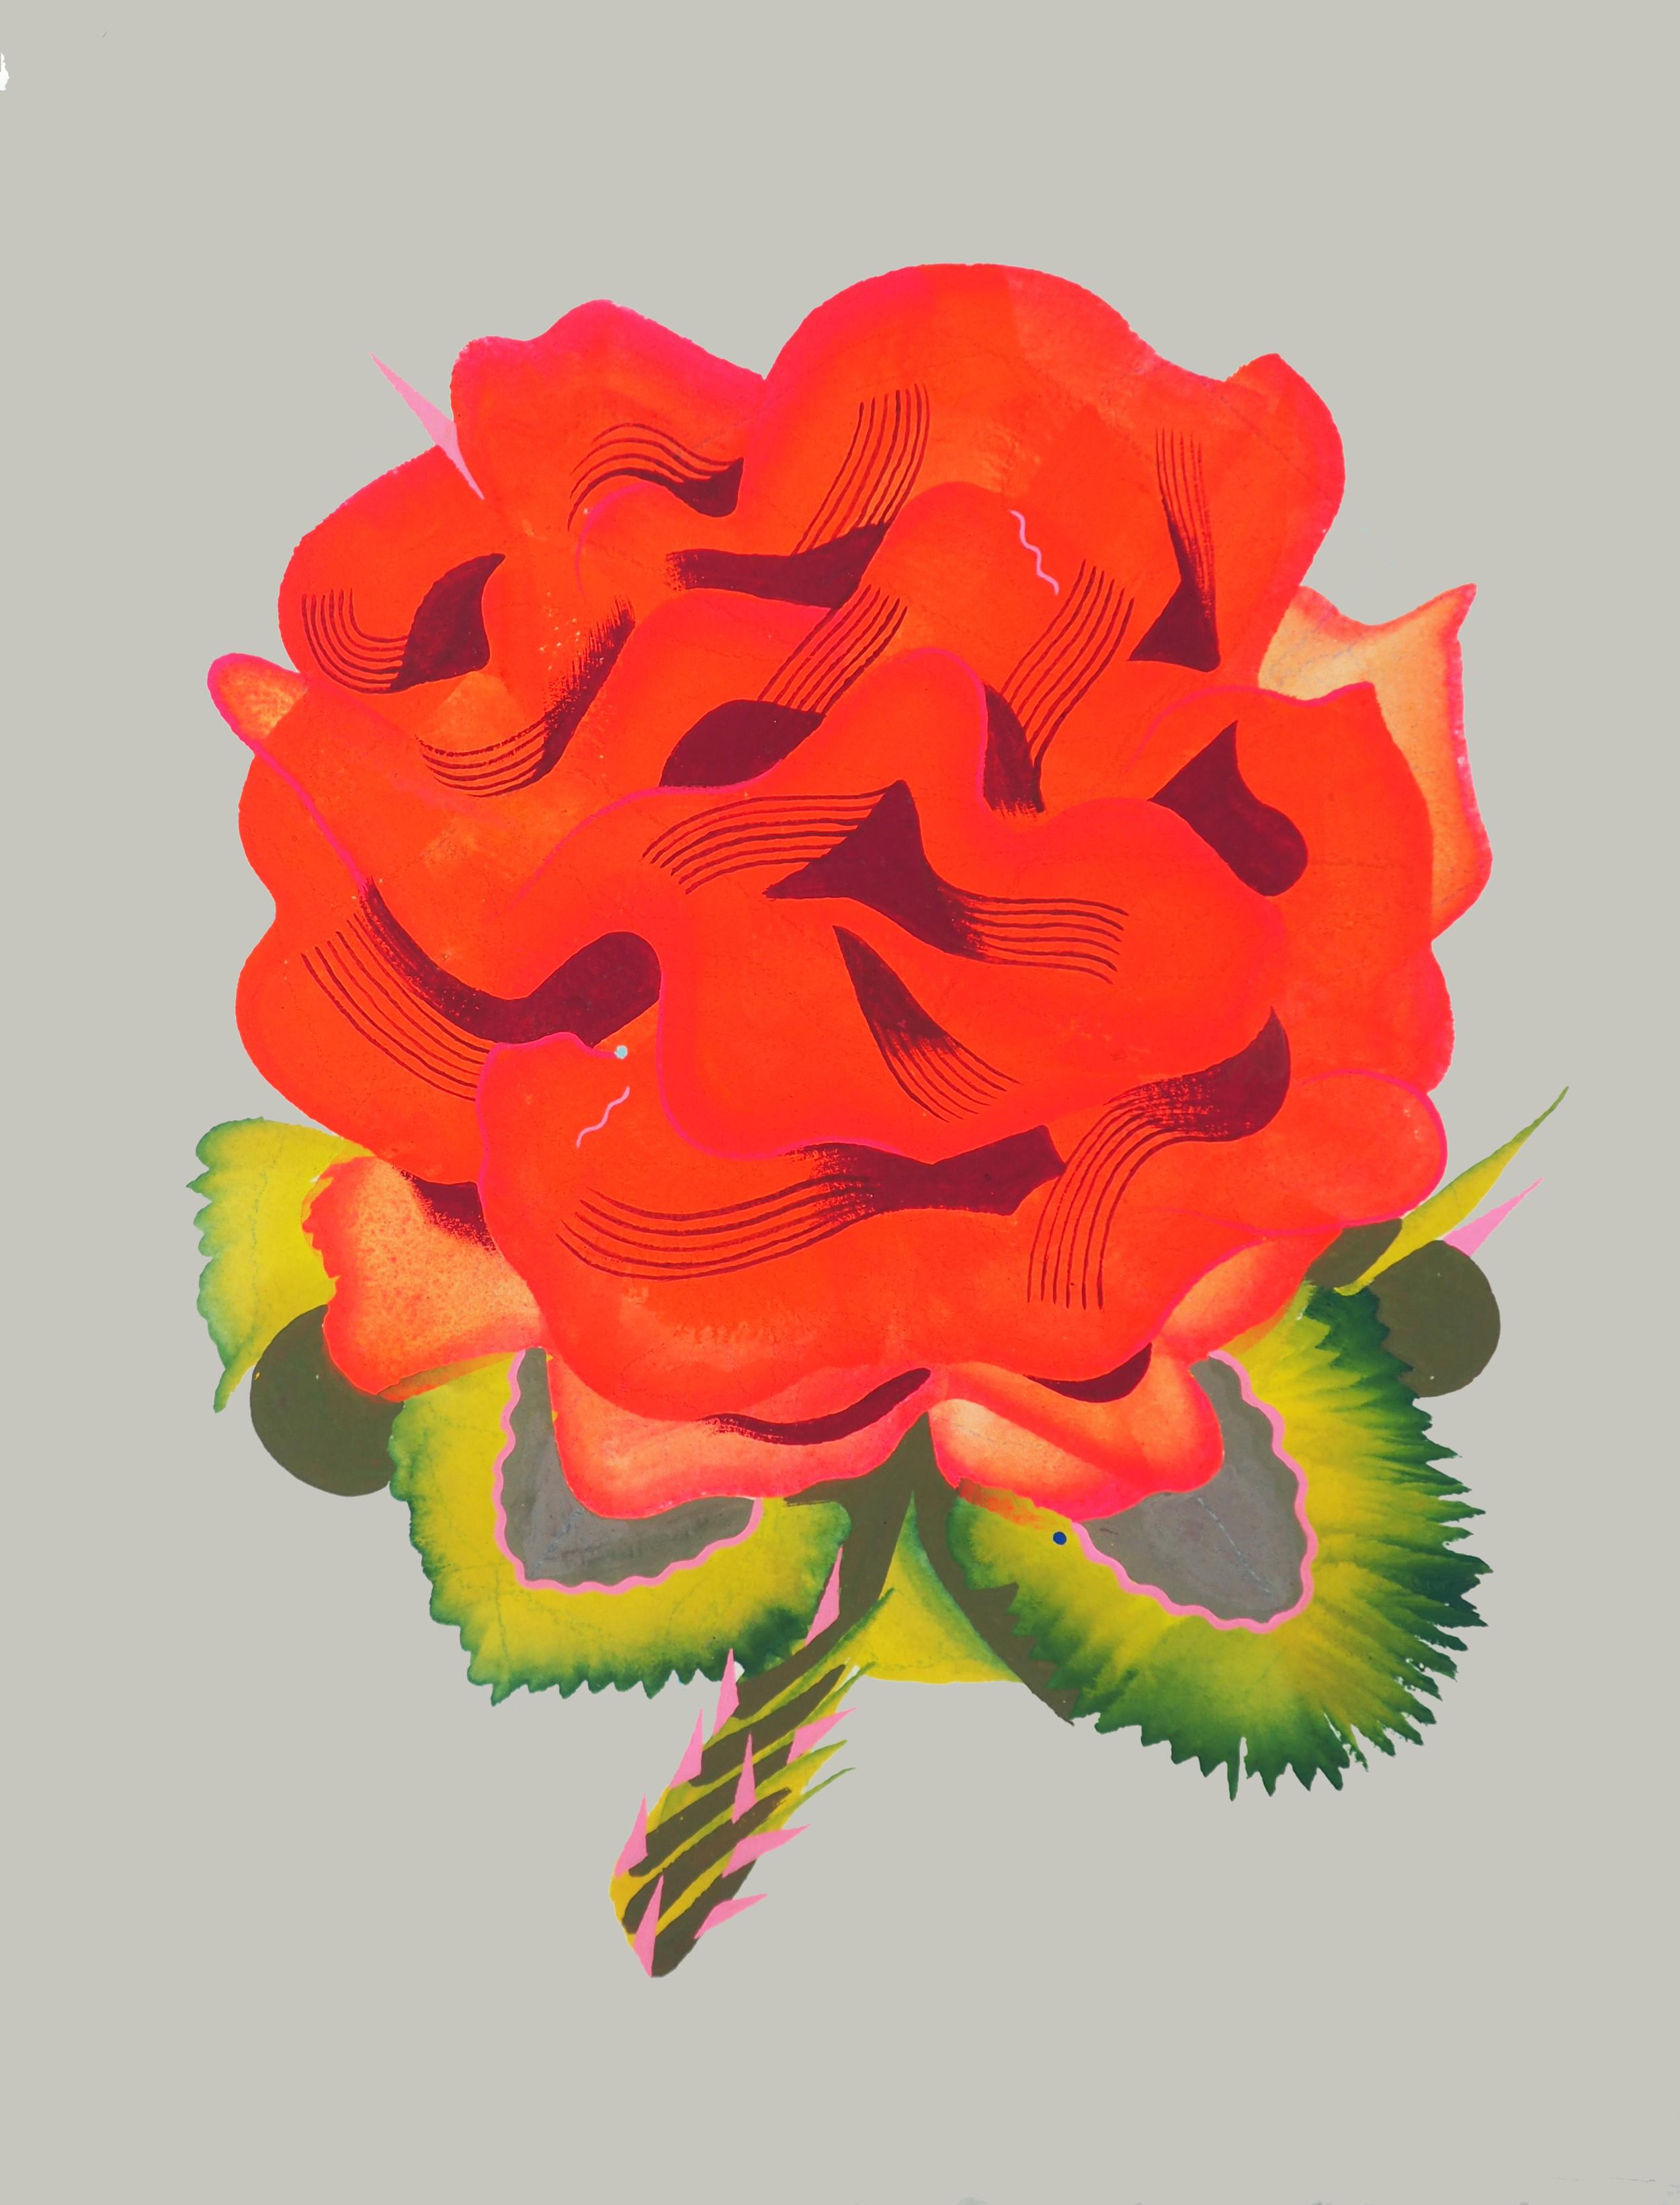 ROS , 2016 [private collection Miami, FL] Gouache, Watercolor on Arches 300 lb. 10 x 8 in.